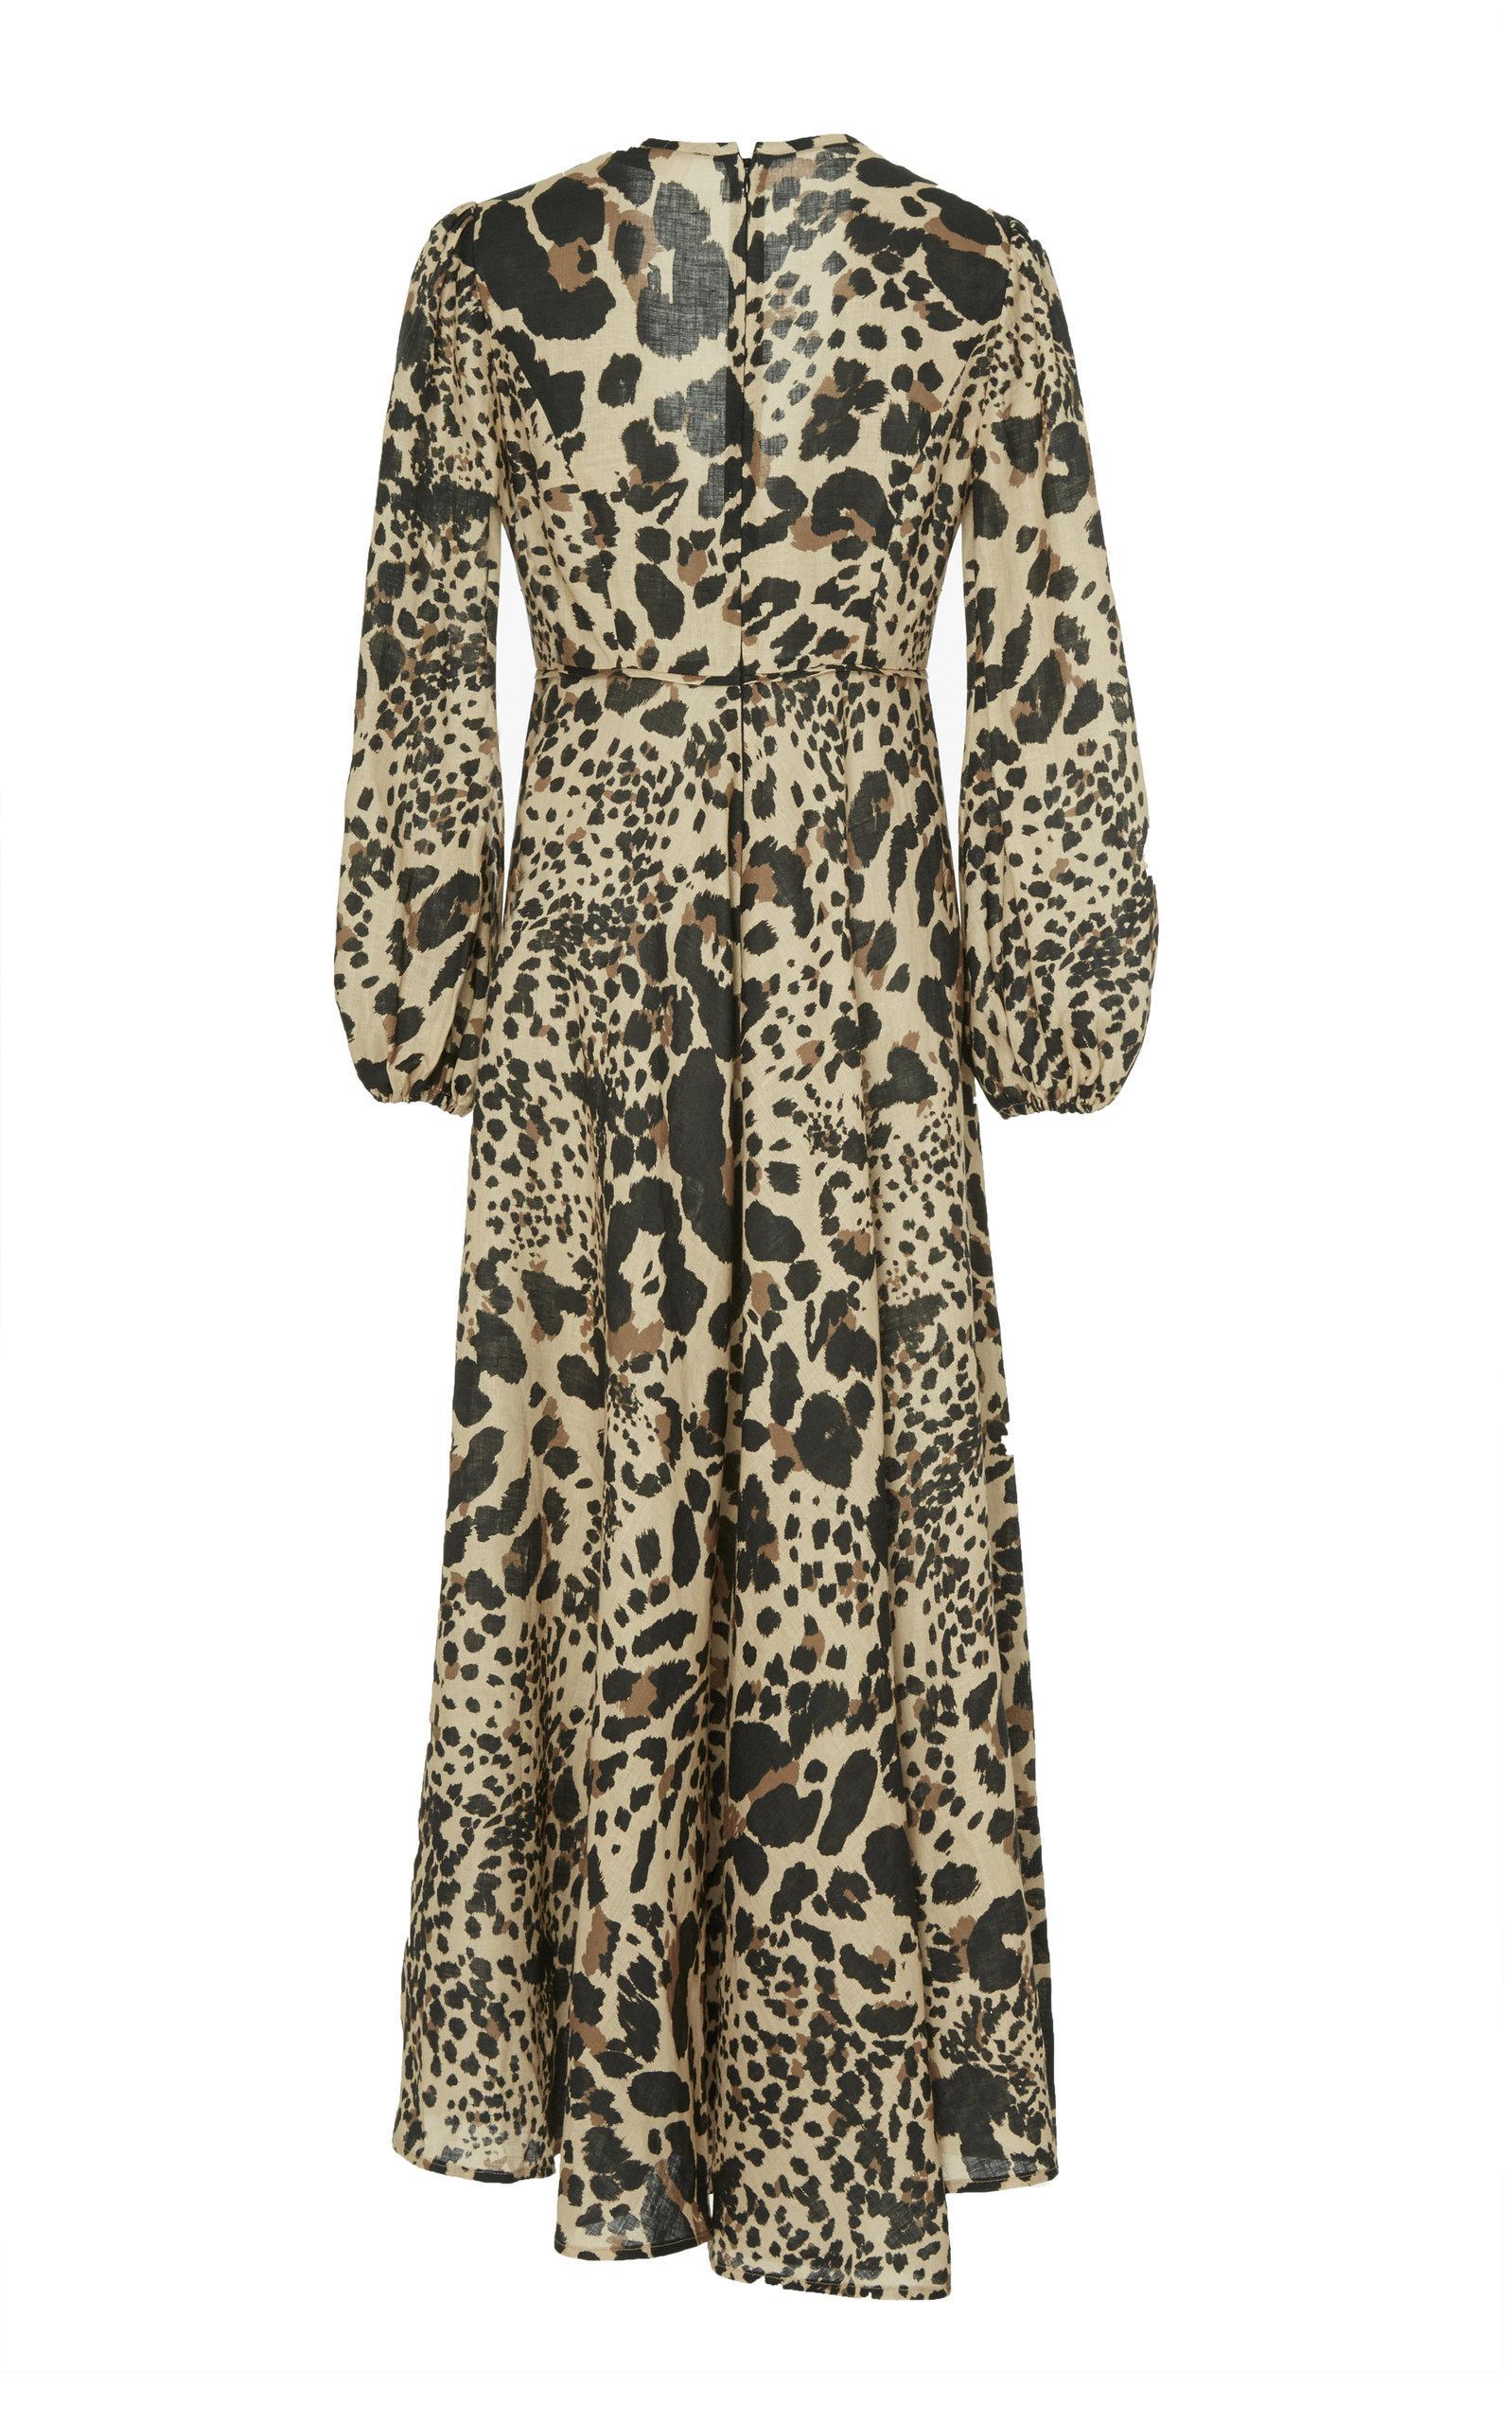 da8cd51fe7f Zimmermann - Multicolor Veneto Printed Linen Maxi Dress - Lyst. View  fullscreen